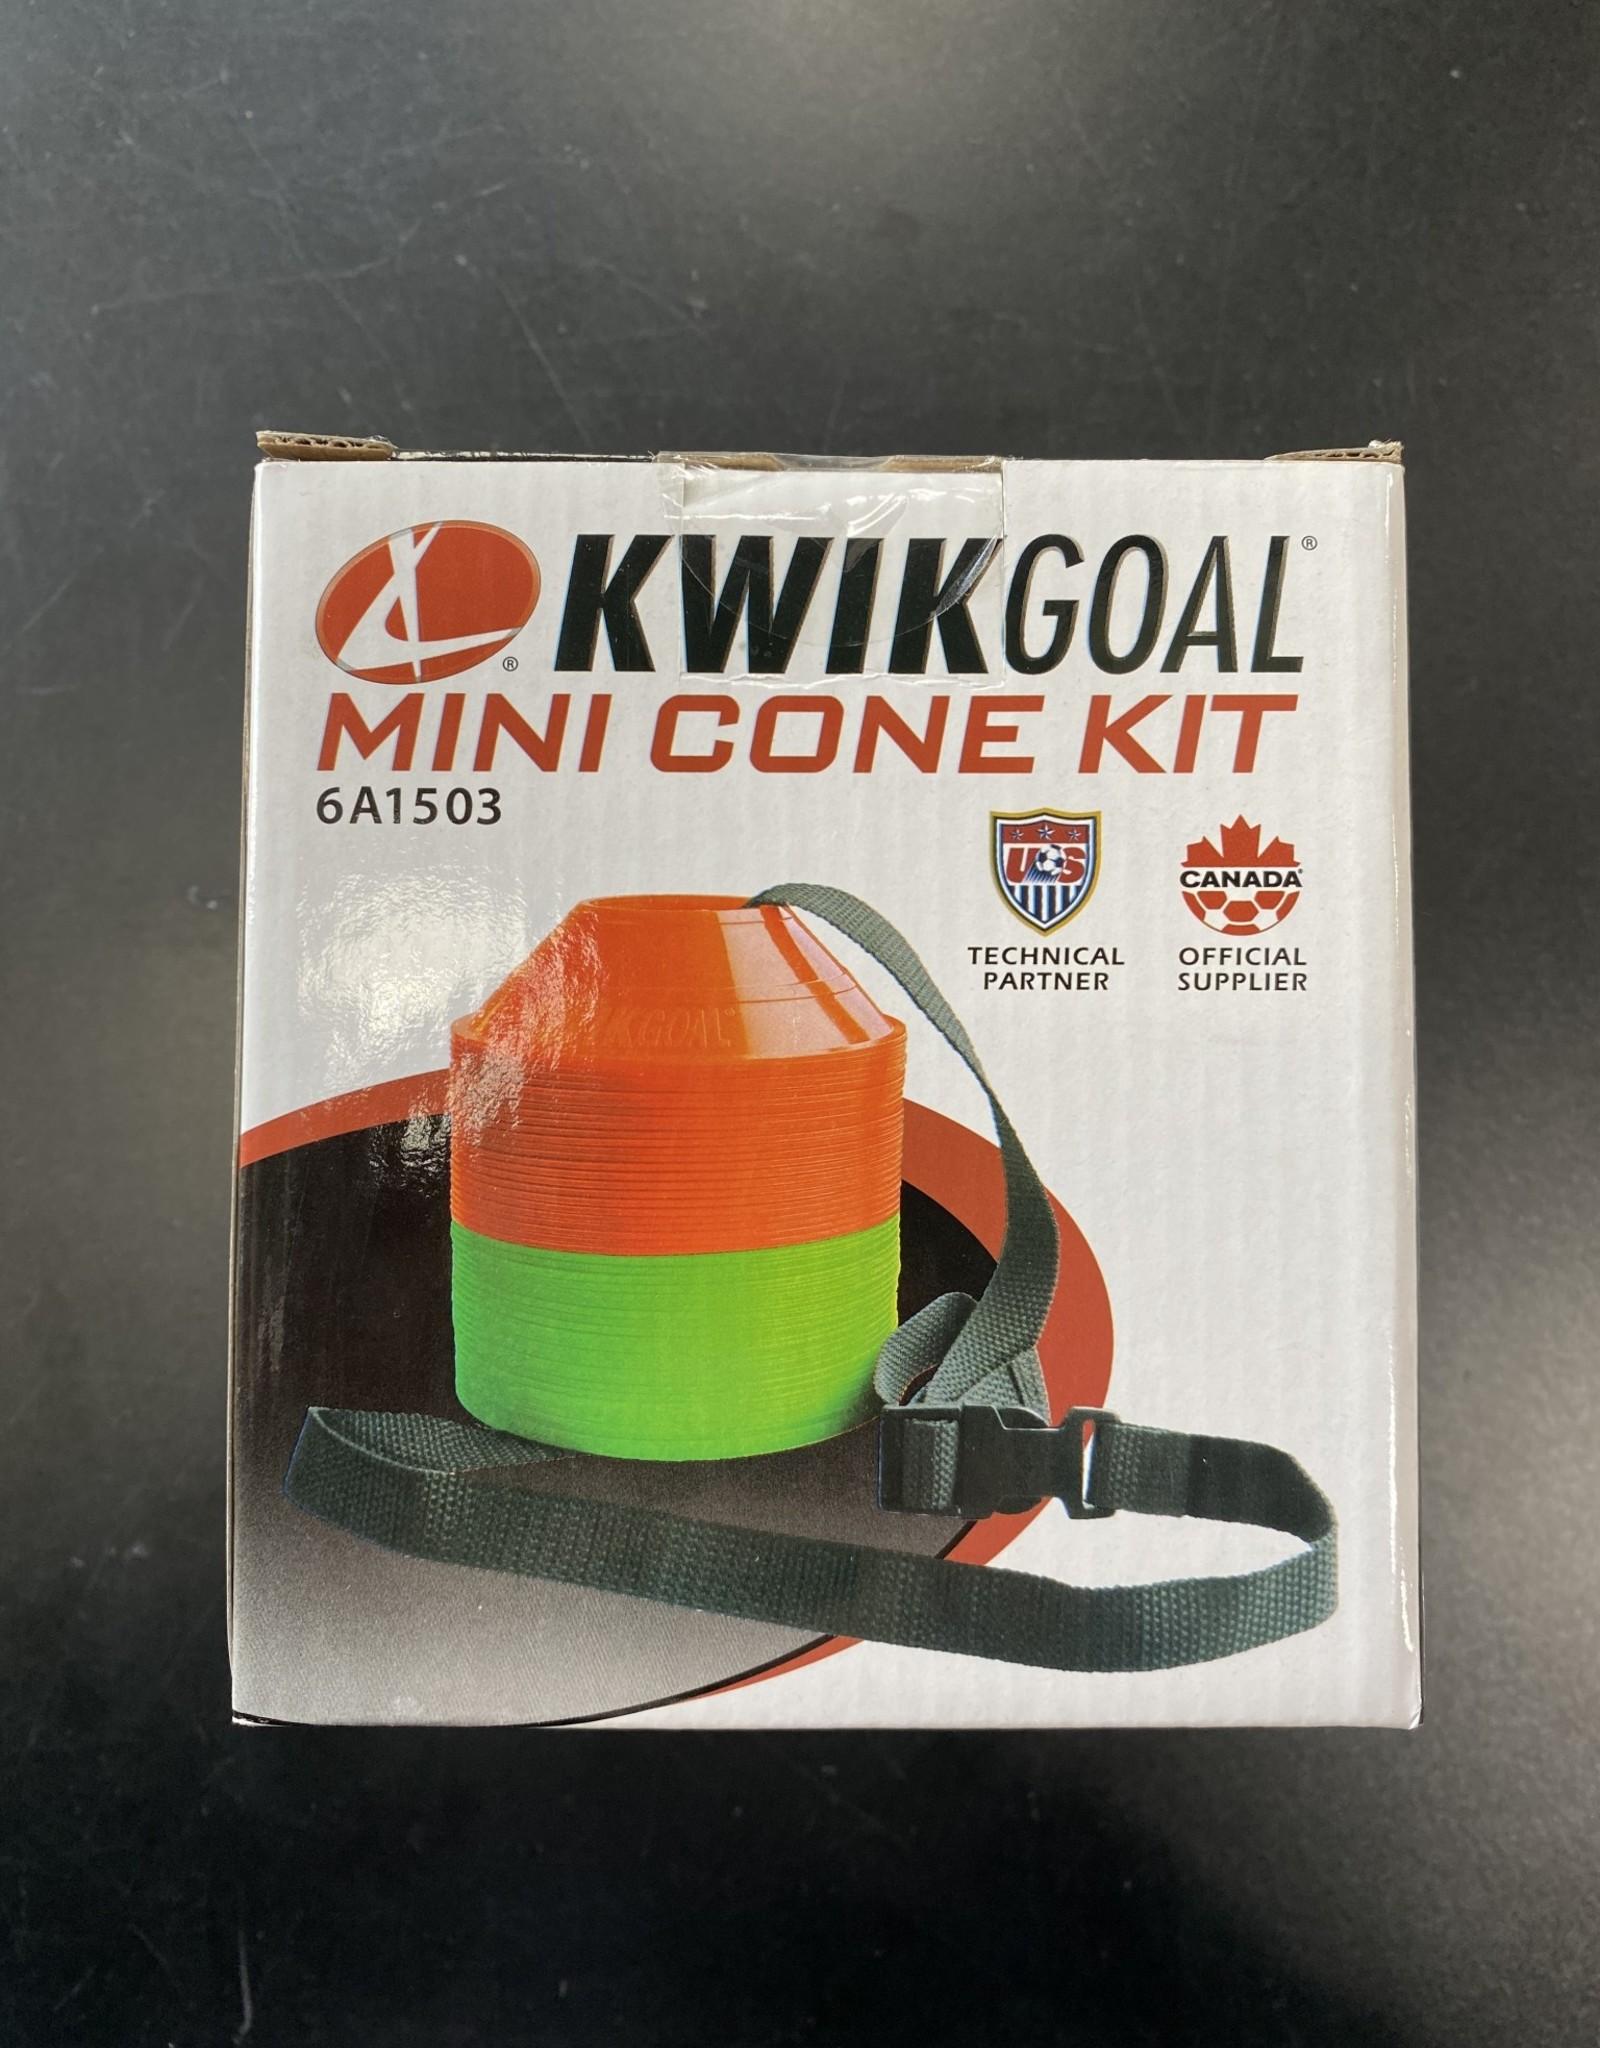 Kwik Goal Kwik Goal Mini Cone Kit orange/green